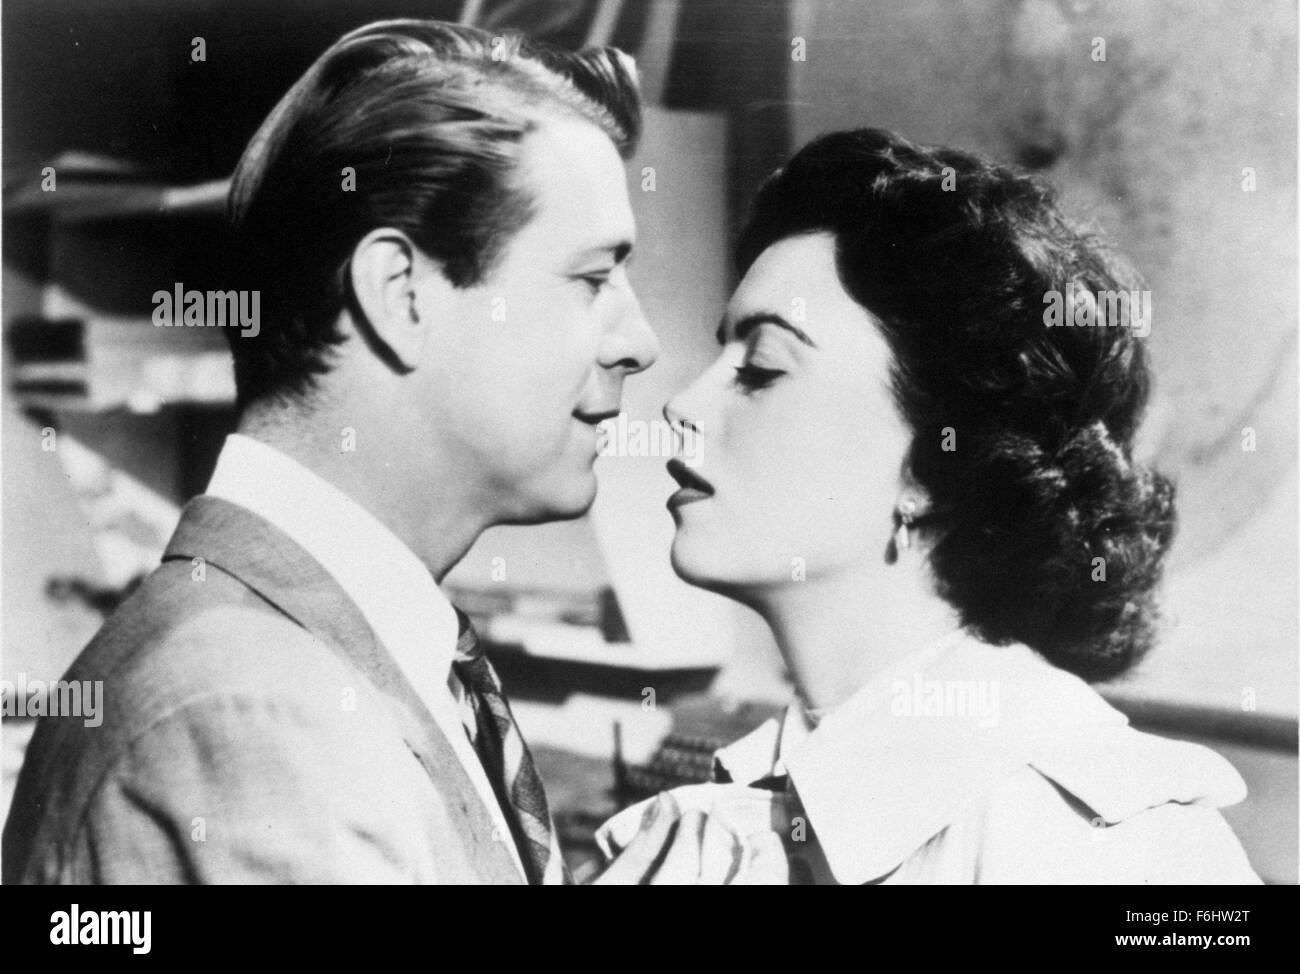 1956, Film Title: ATOMIC MAN, Director: KEN HUGHES, Studio: UK, Pictured: FAITH DOMERGUE, GENE NELSON, ROMANCE, - Stock Image